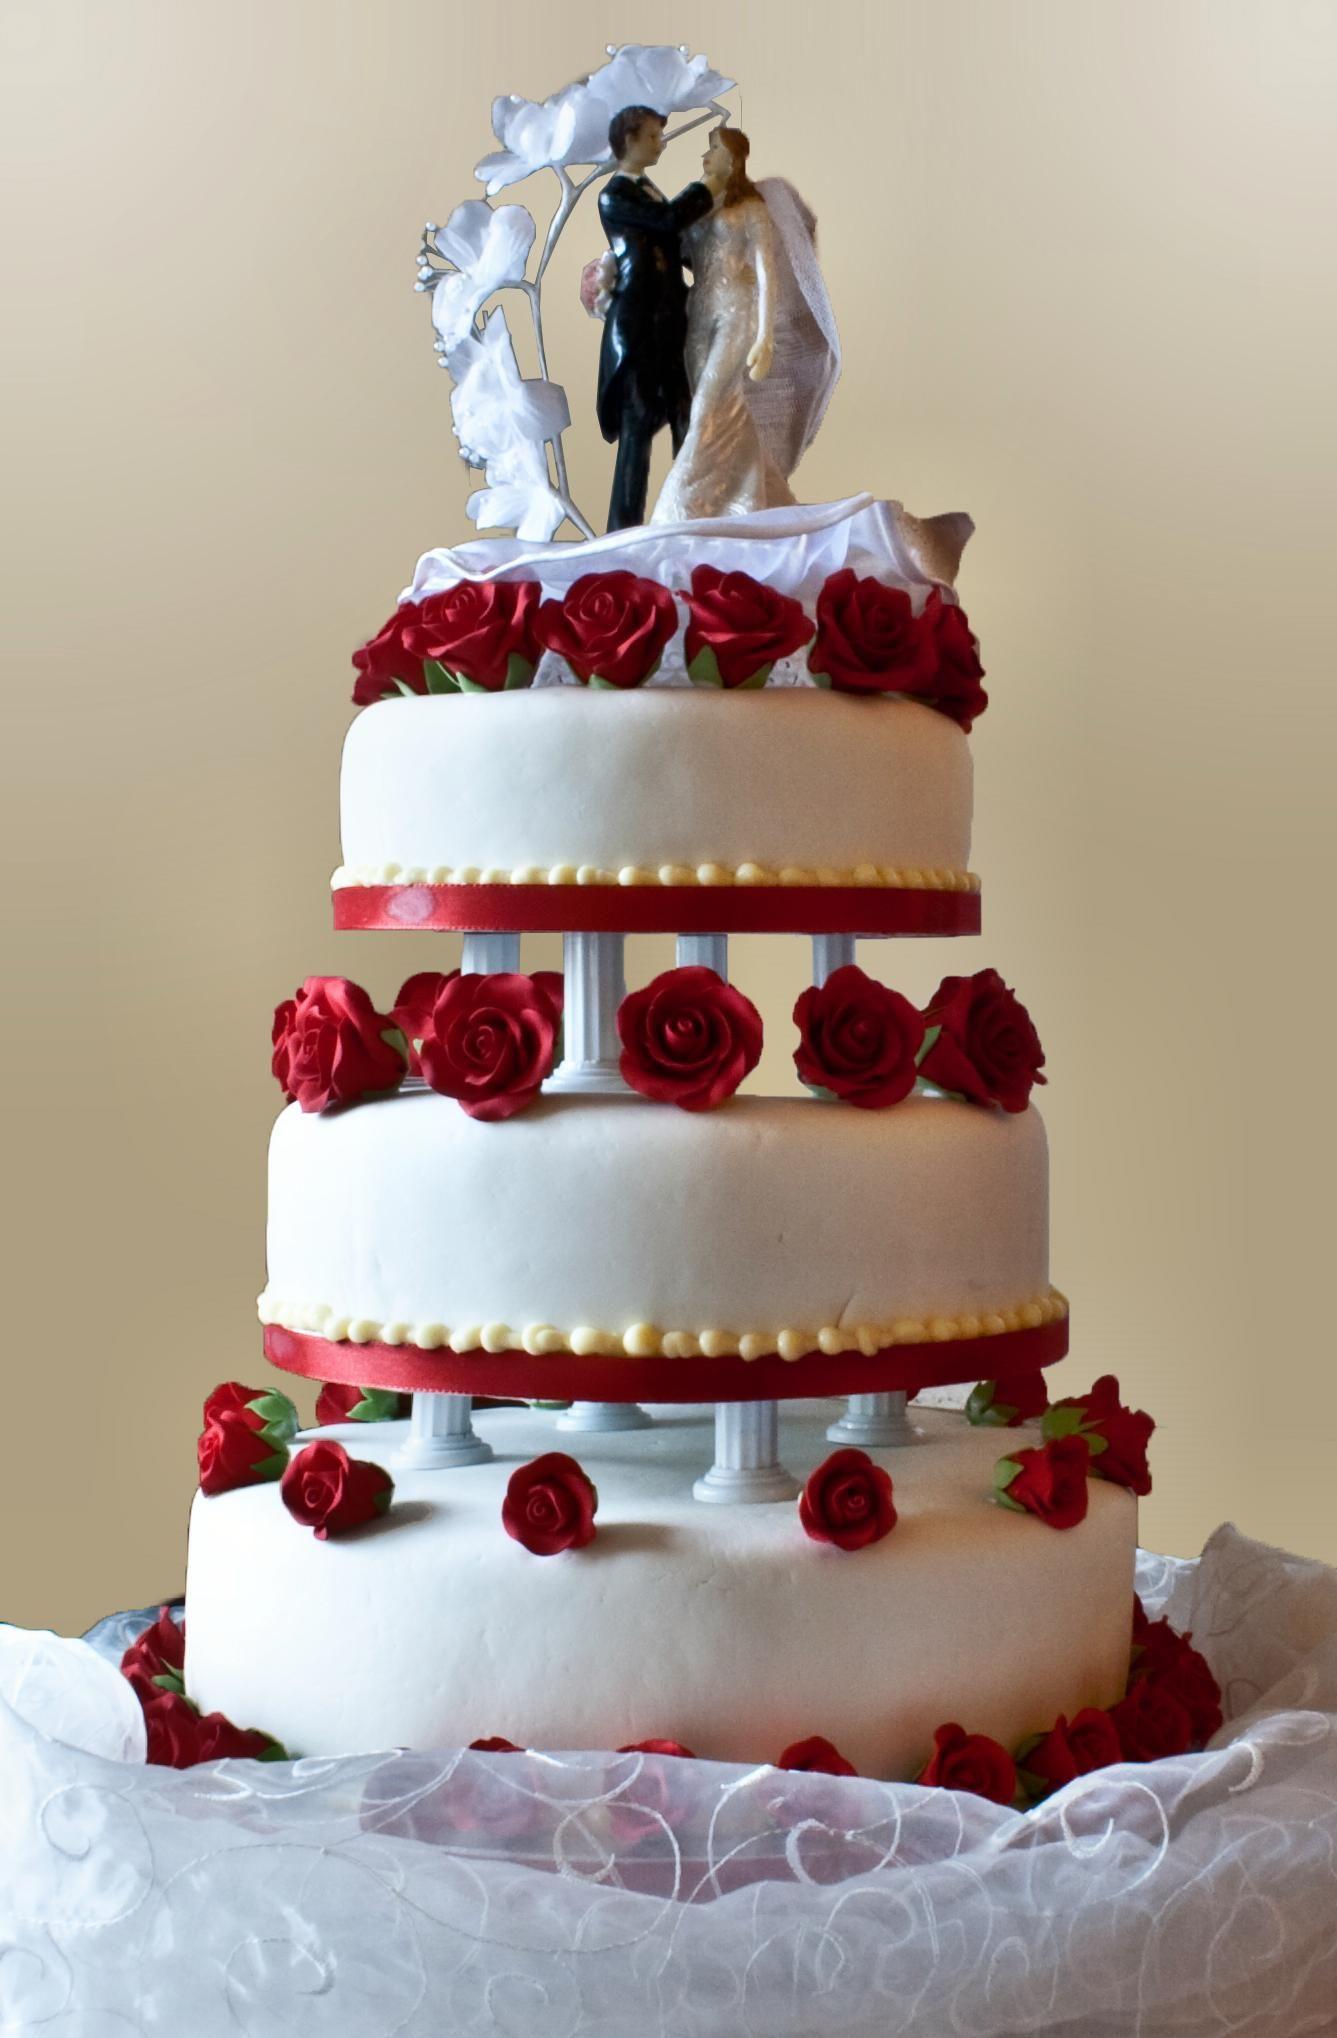 Wedding Cake With Pillar Supports 2009 Wedding Cake Red Wedding Cake Cost Wedding Cake Decorations